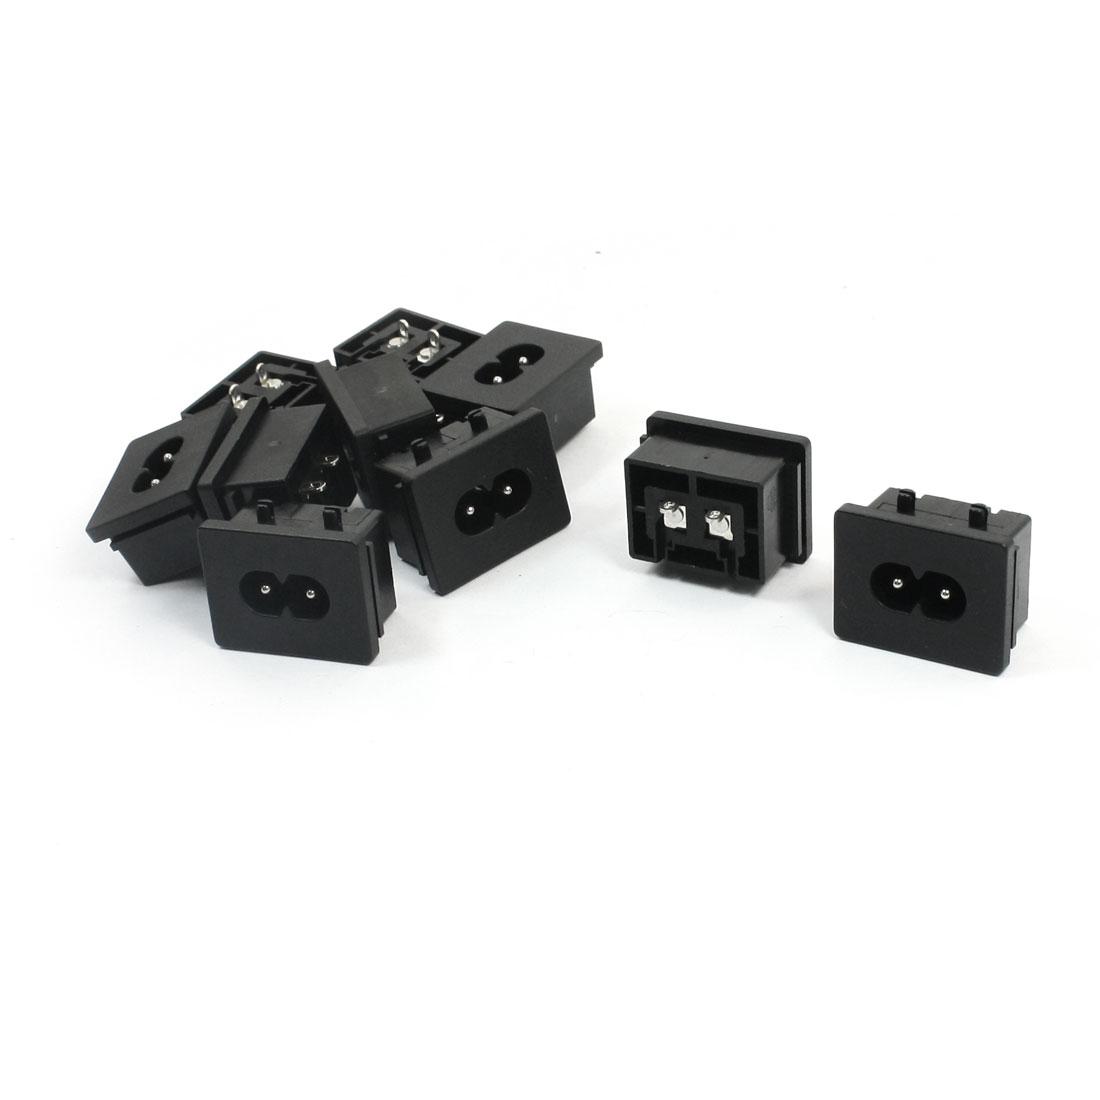 AC 250V 10A IEC320 C8 Male PCB Board Soldering Power Adapter 10Pcs